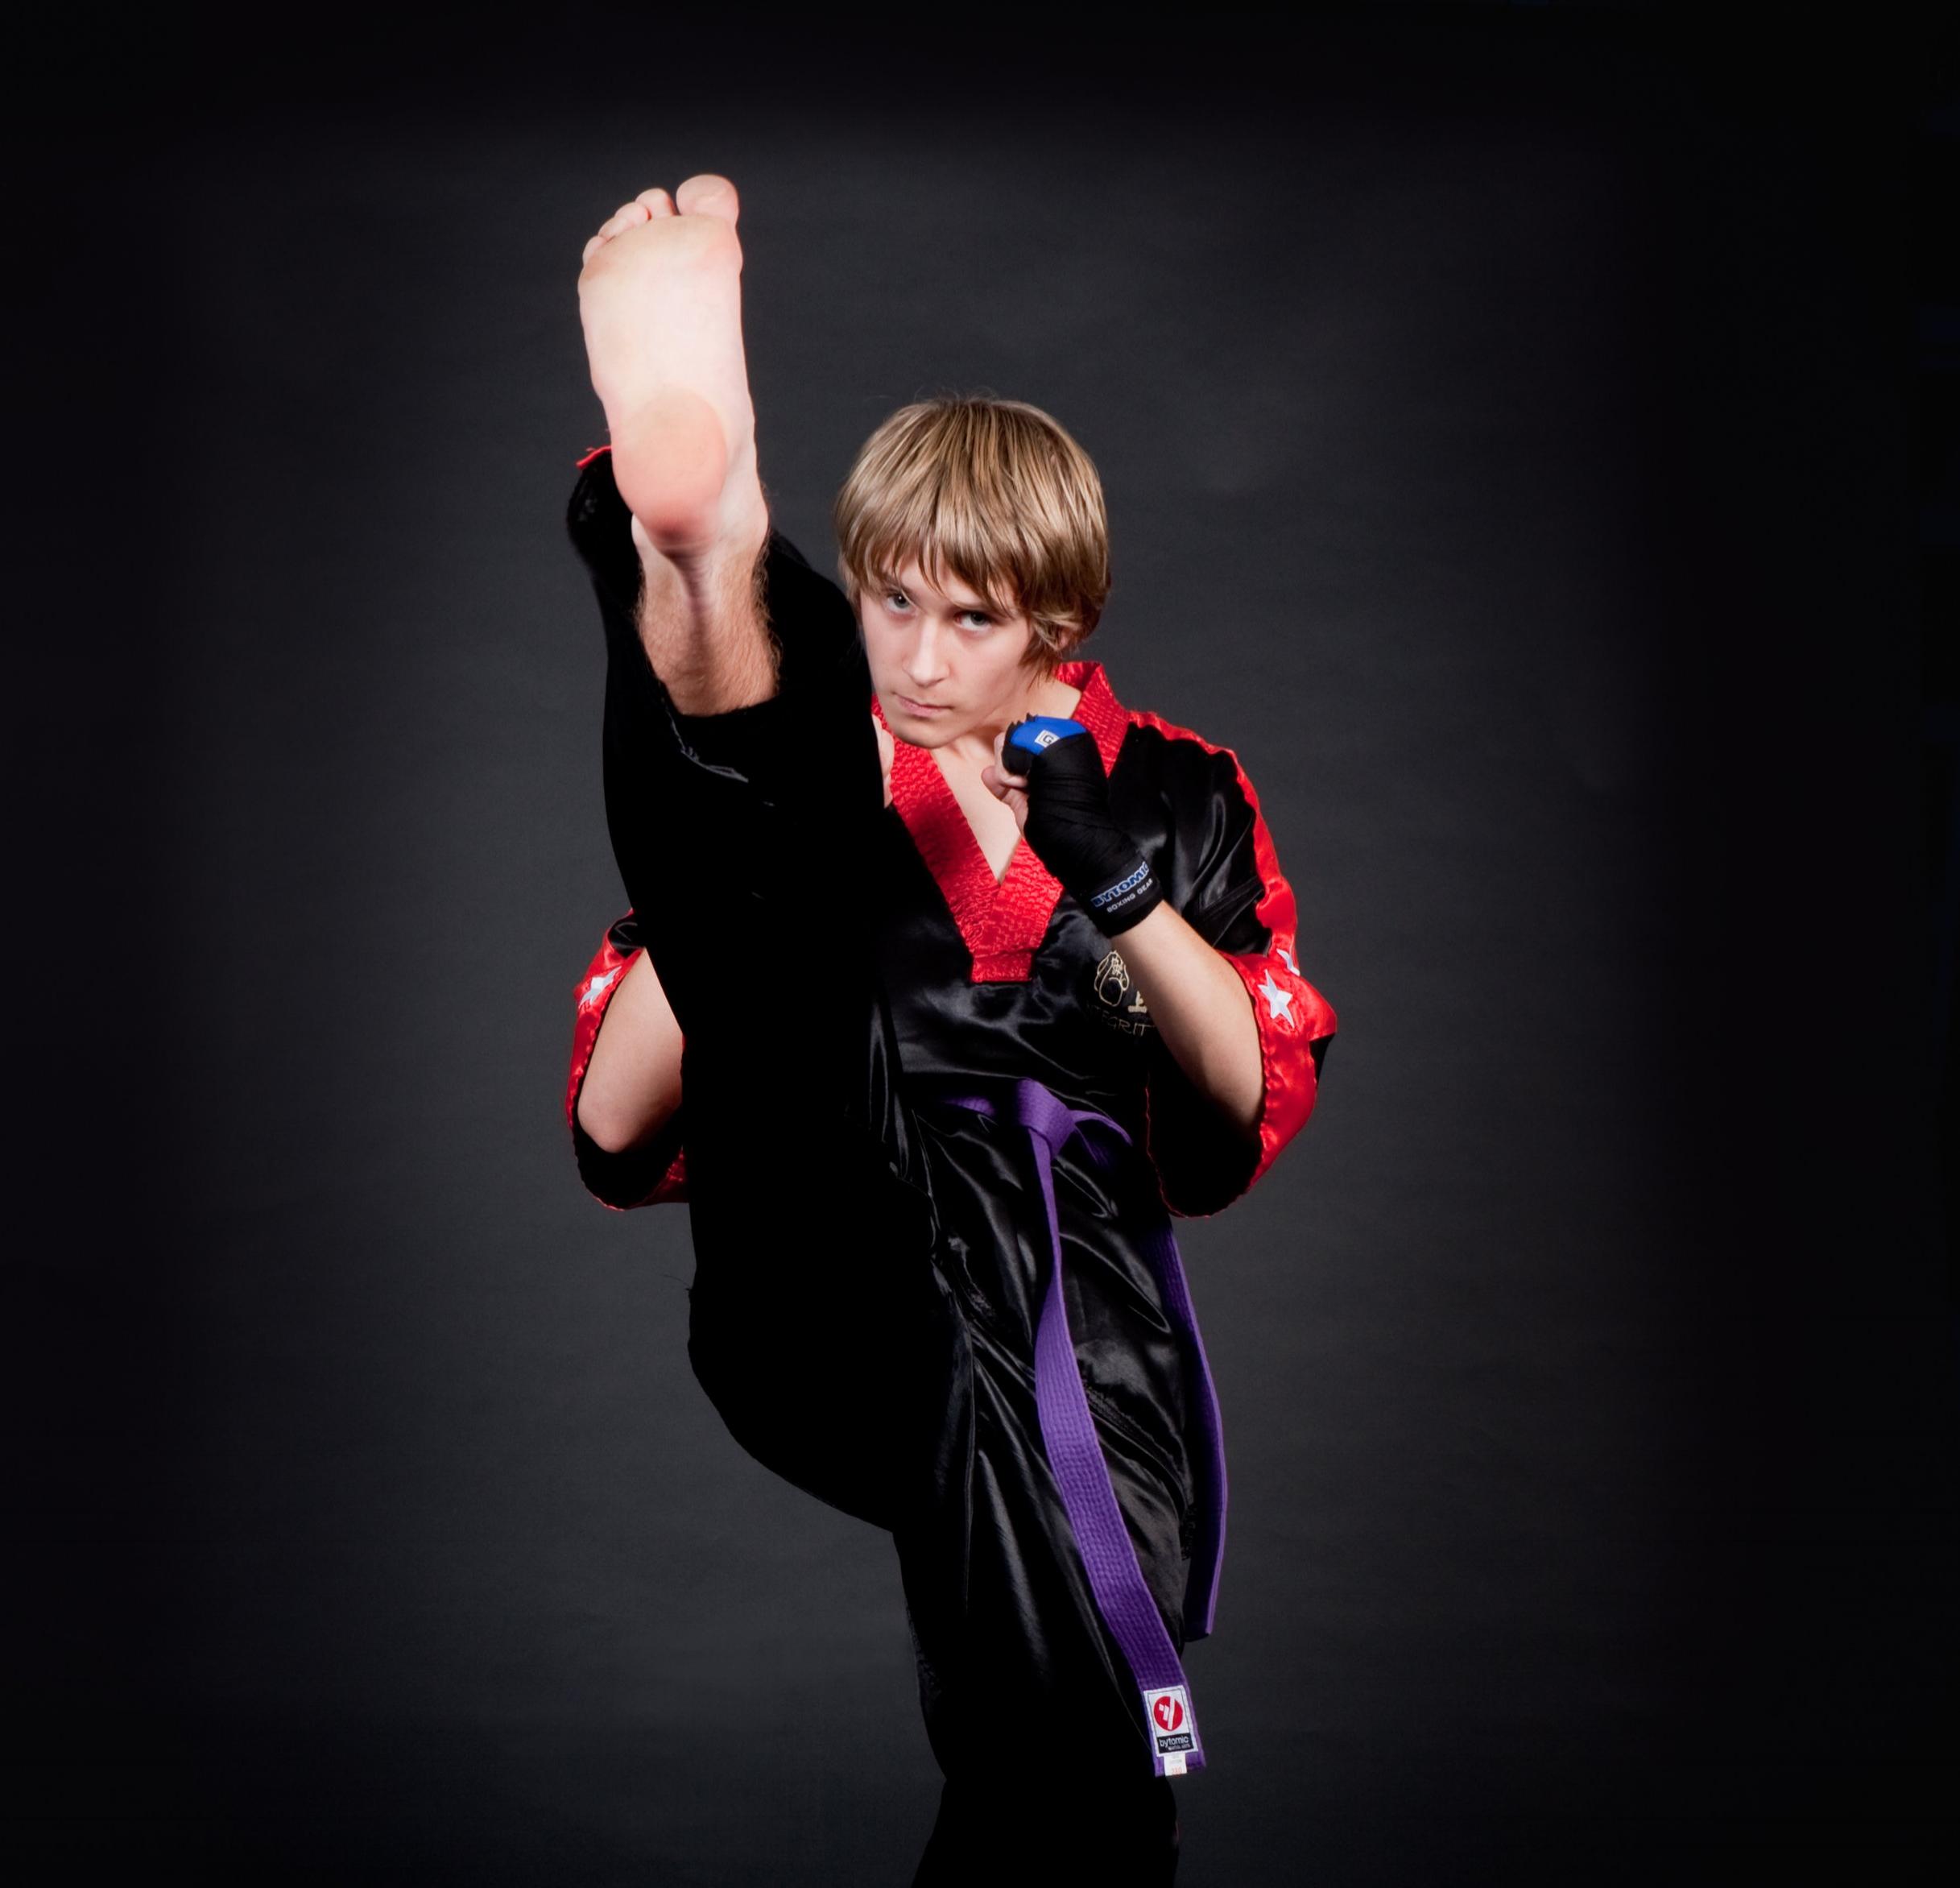 kickboxing_28.10.09_0254.jpg